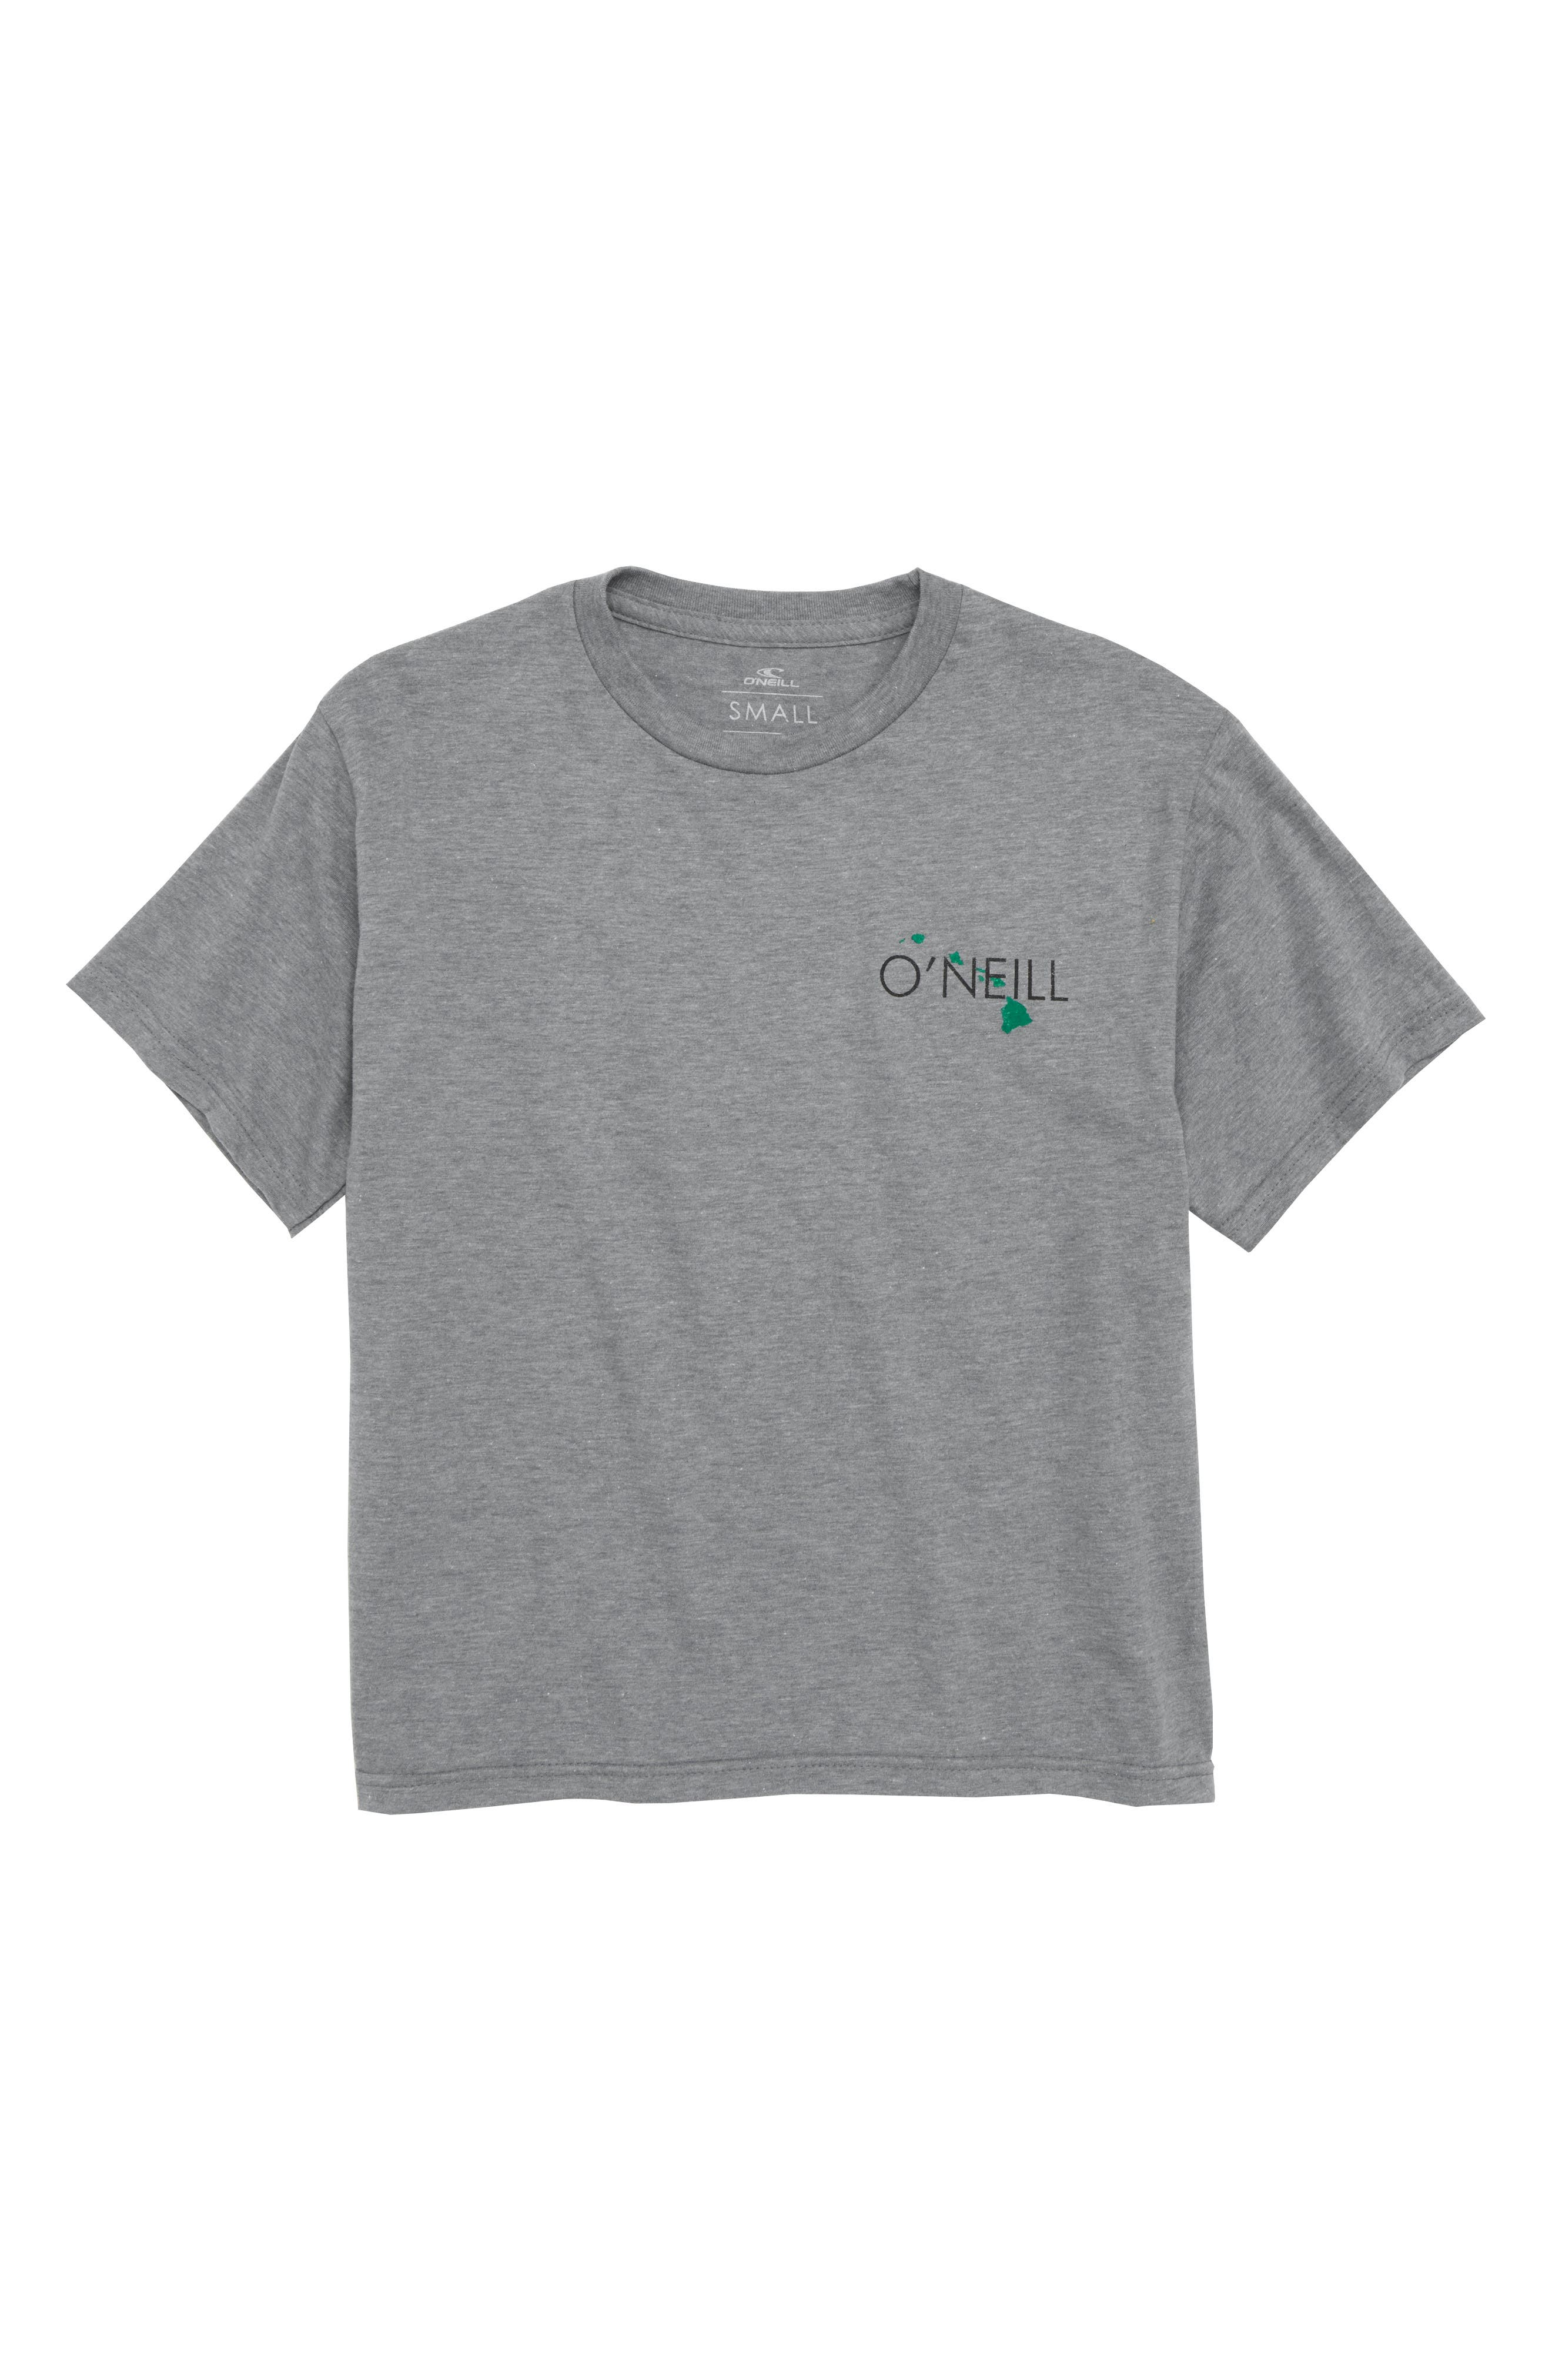 State of Aloha T-Shirt,                         Main,                         color, Medium Heather Grey